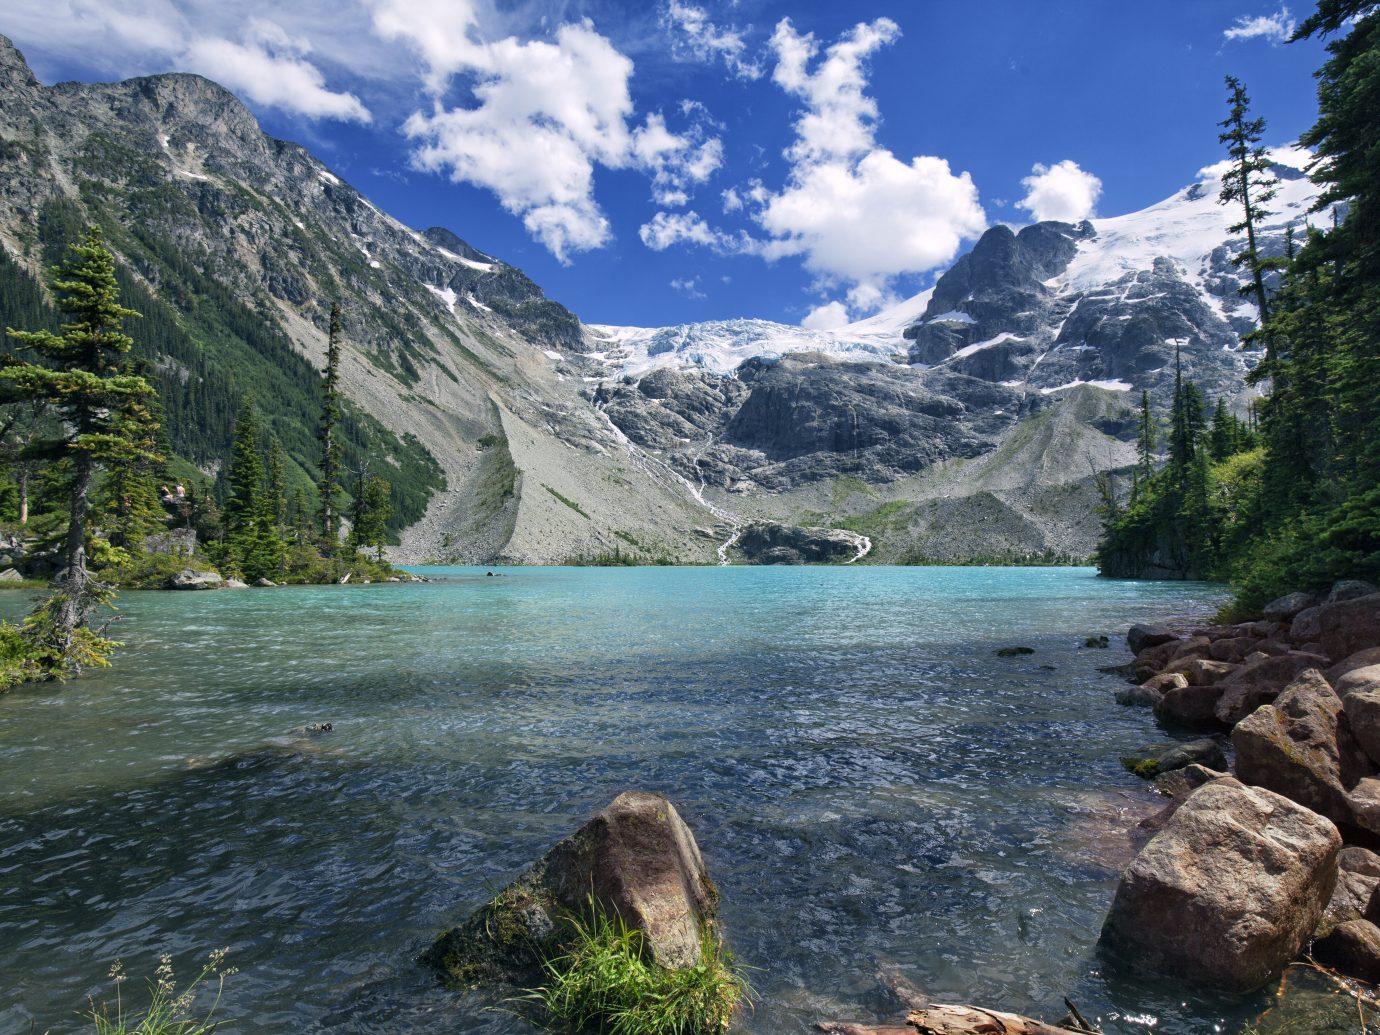 Upper Joffre Lake in summer in Pemberton, BC, Canada